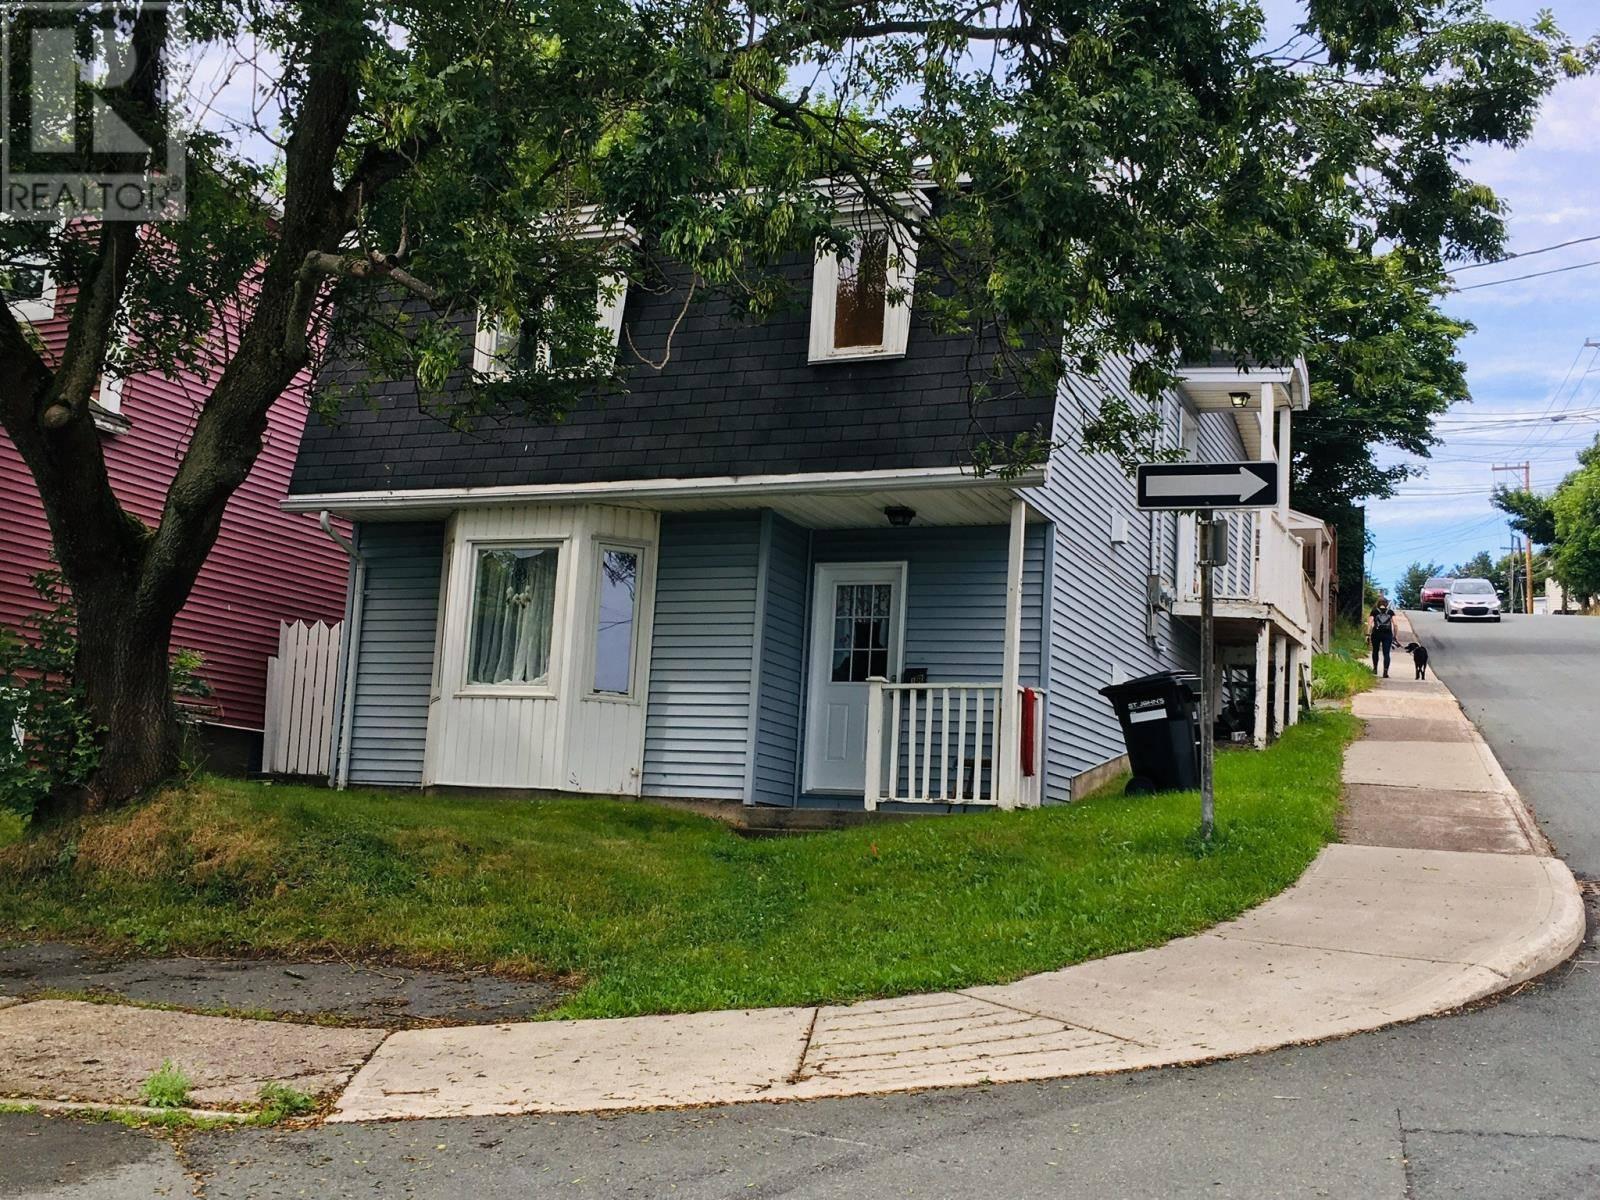 House for sale at 51 Leslie St St. John's Newfoundland - MLS: 1201200